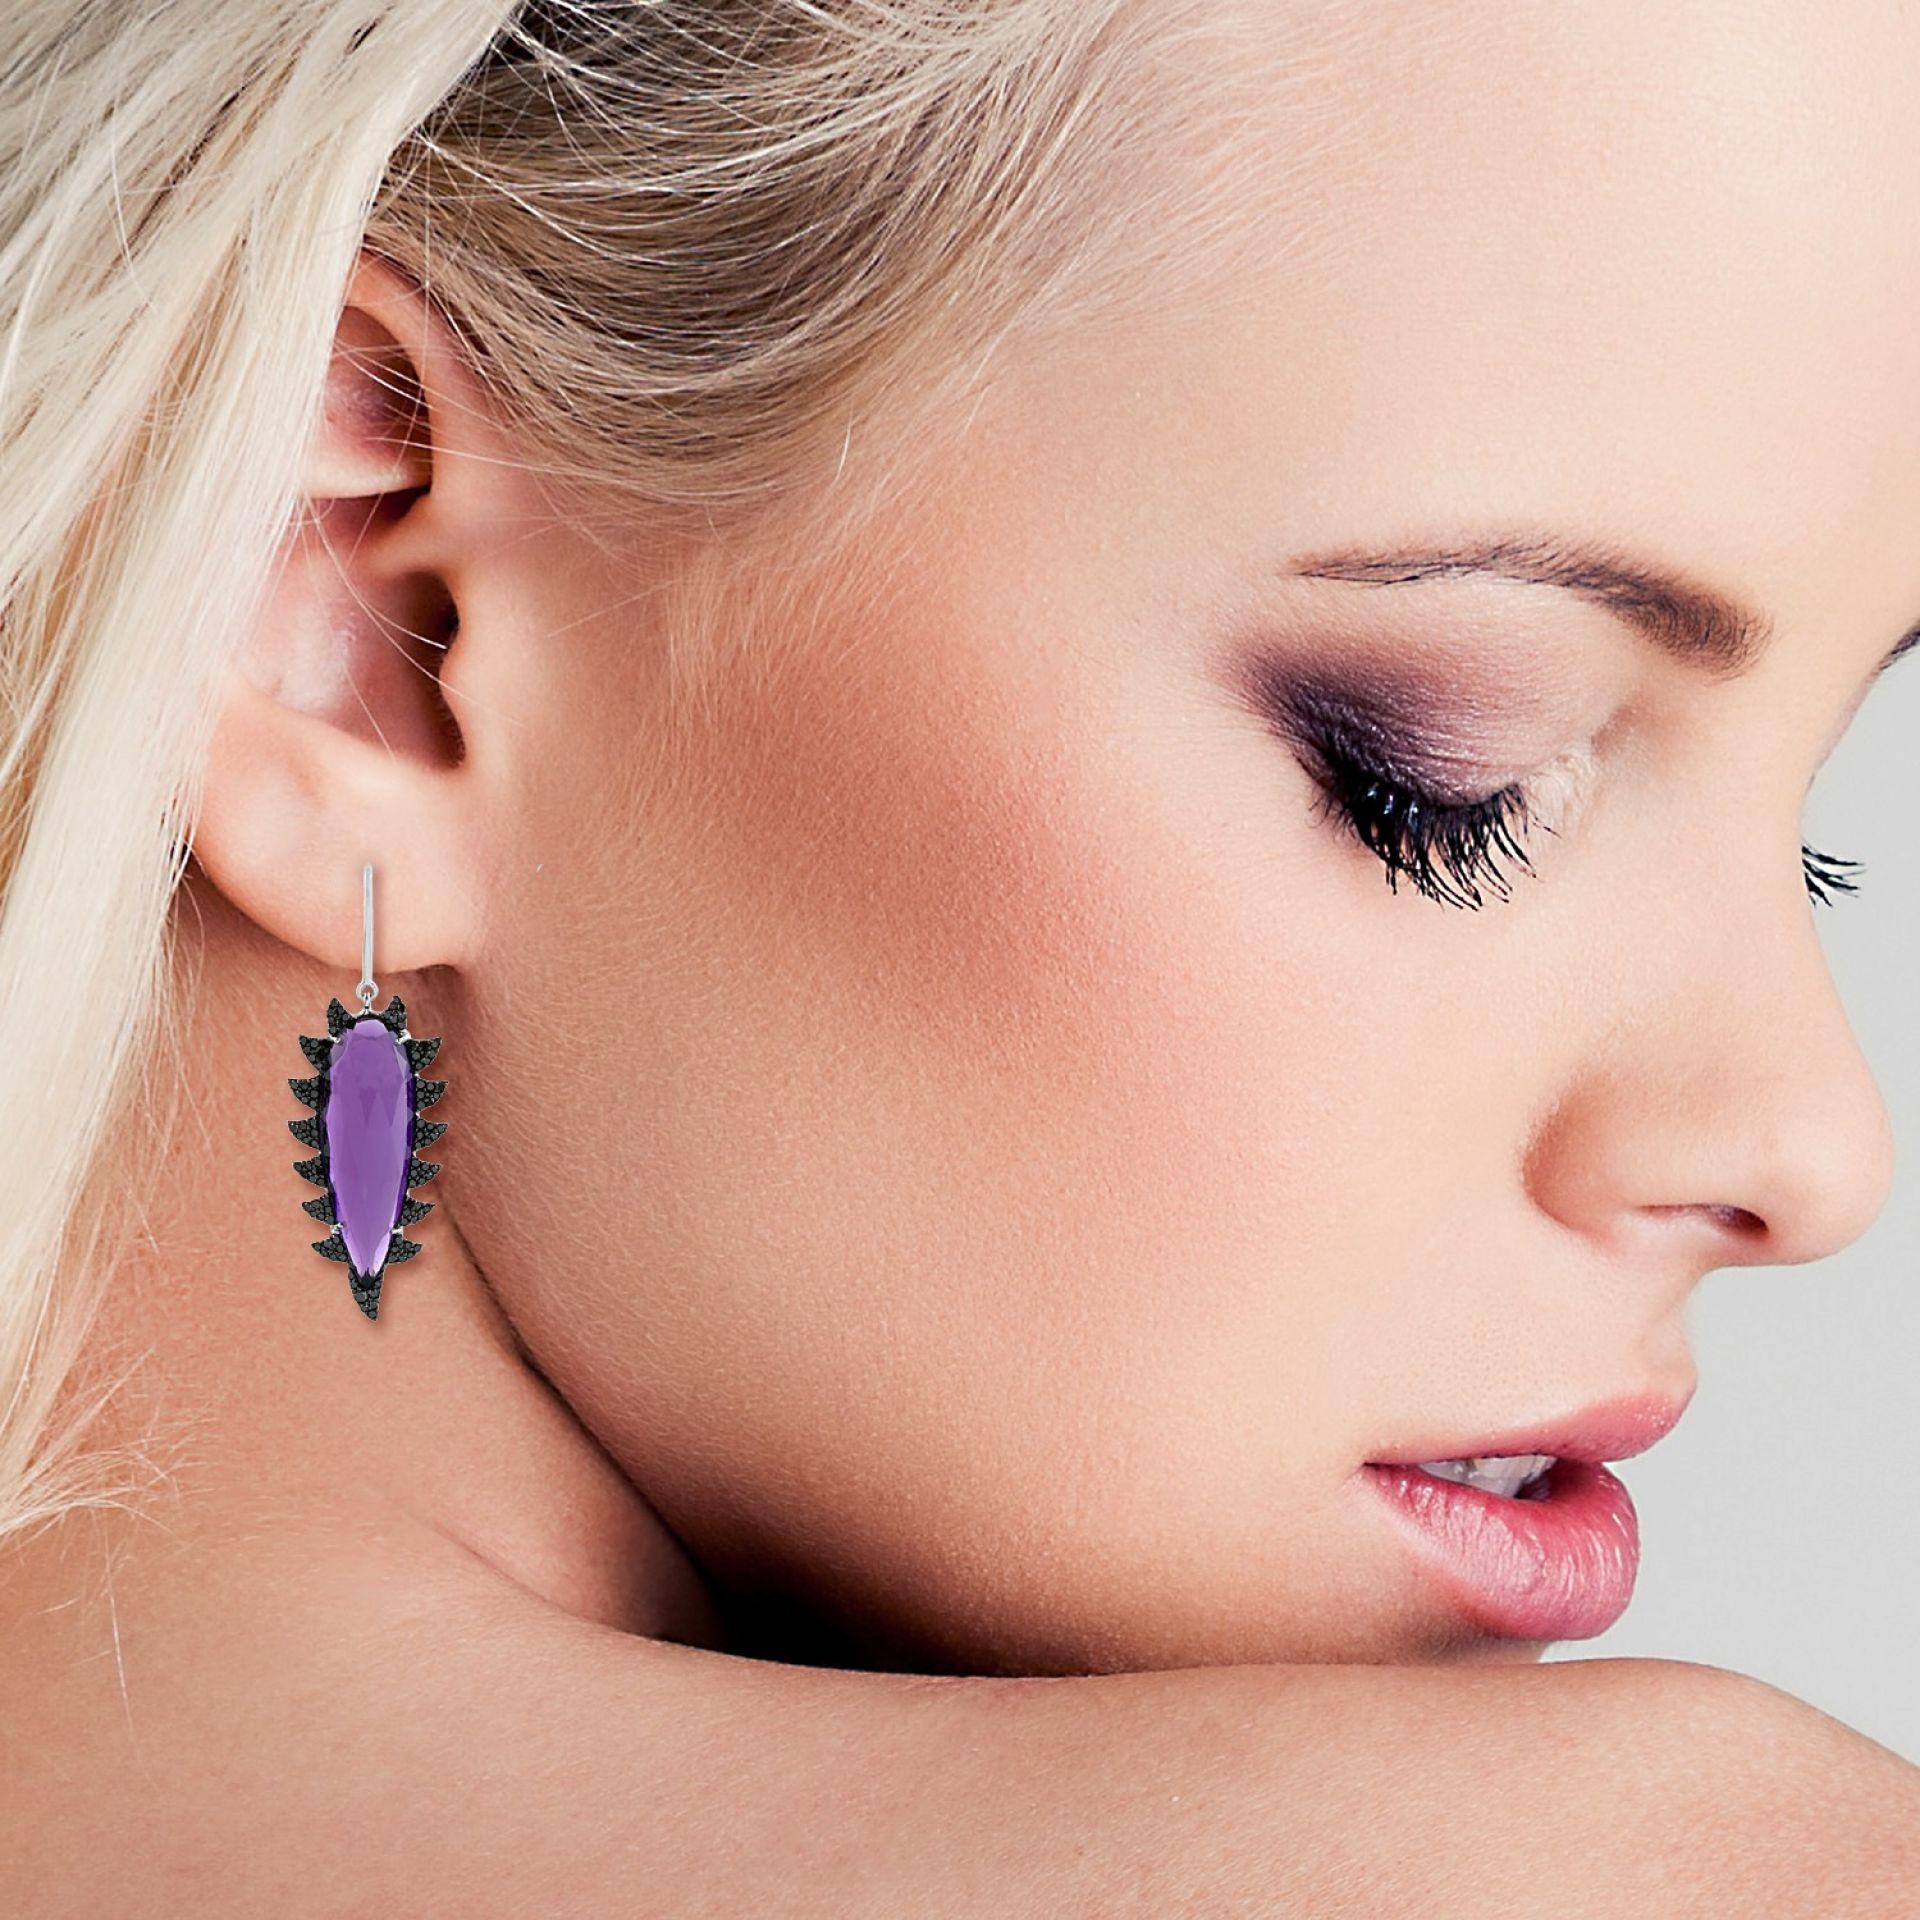 Meghna Jewels Claw Drop Earrings Green Onyx & Black Diamonds